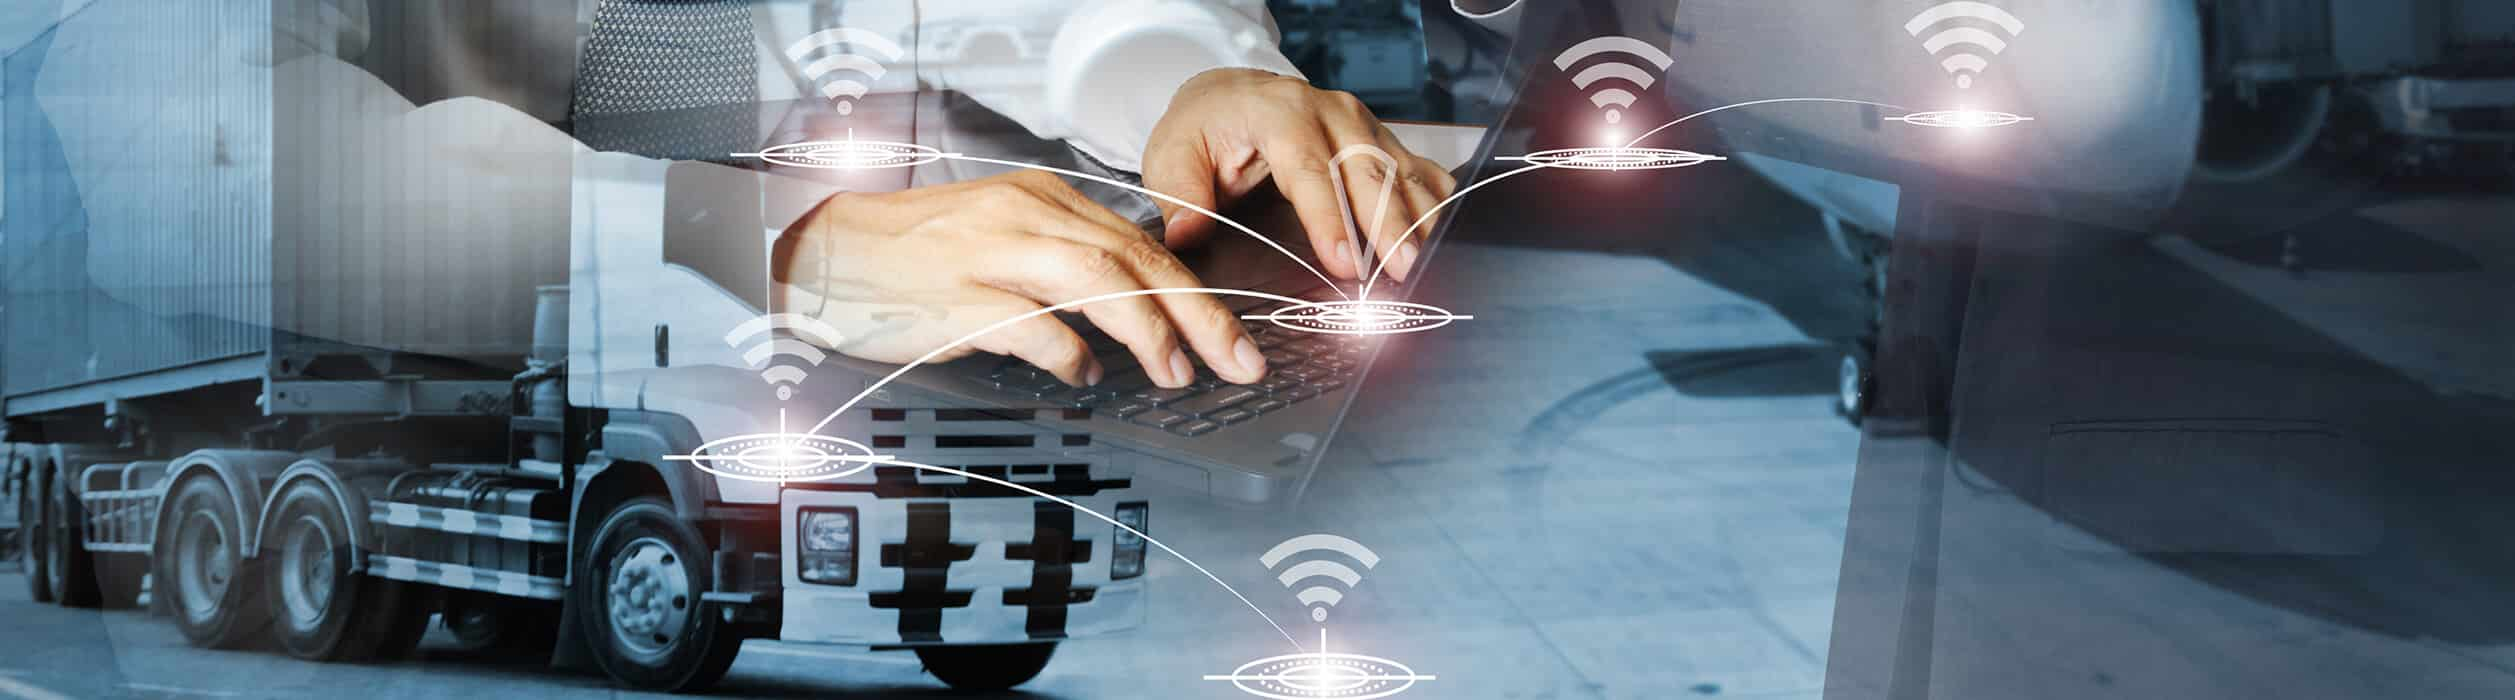 Mann hält Tablet in der Hand und benchmarkt Beschaffungslogistik